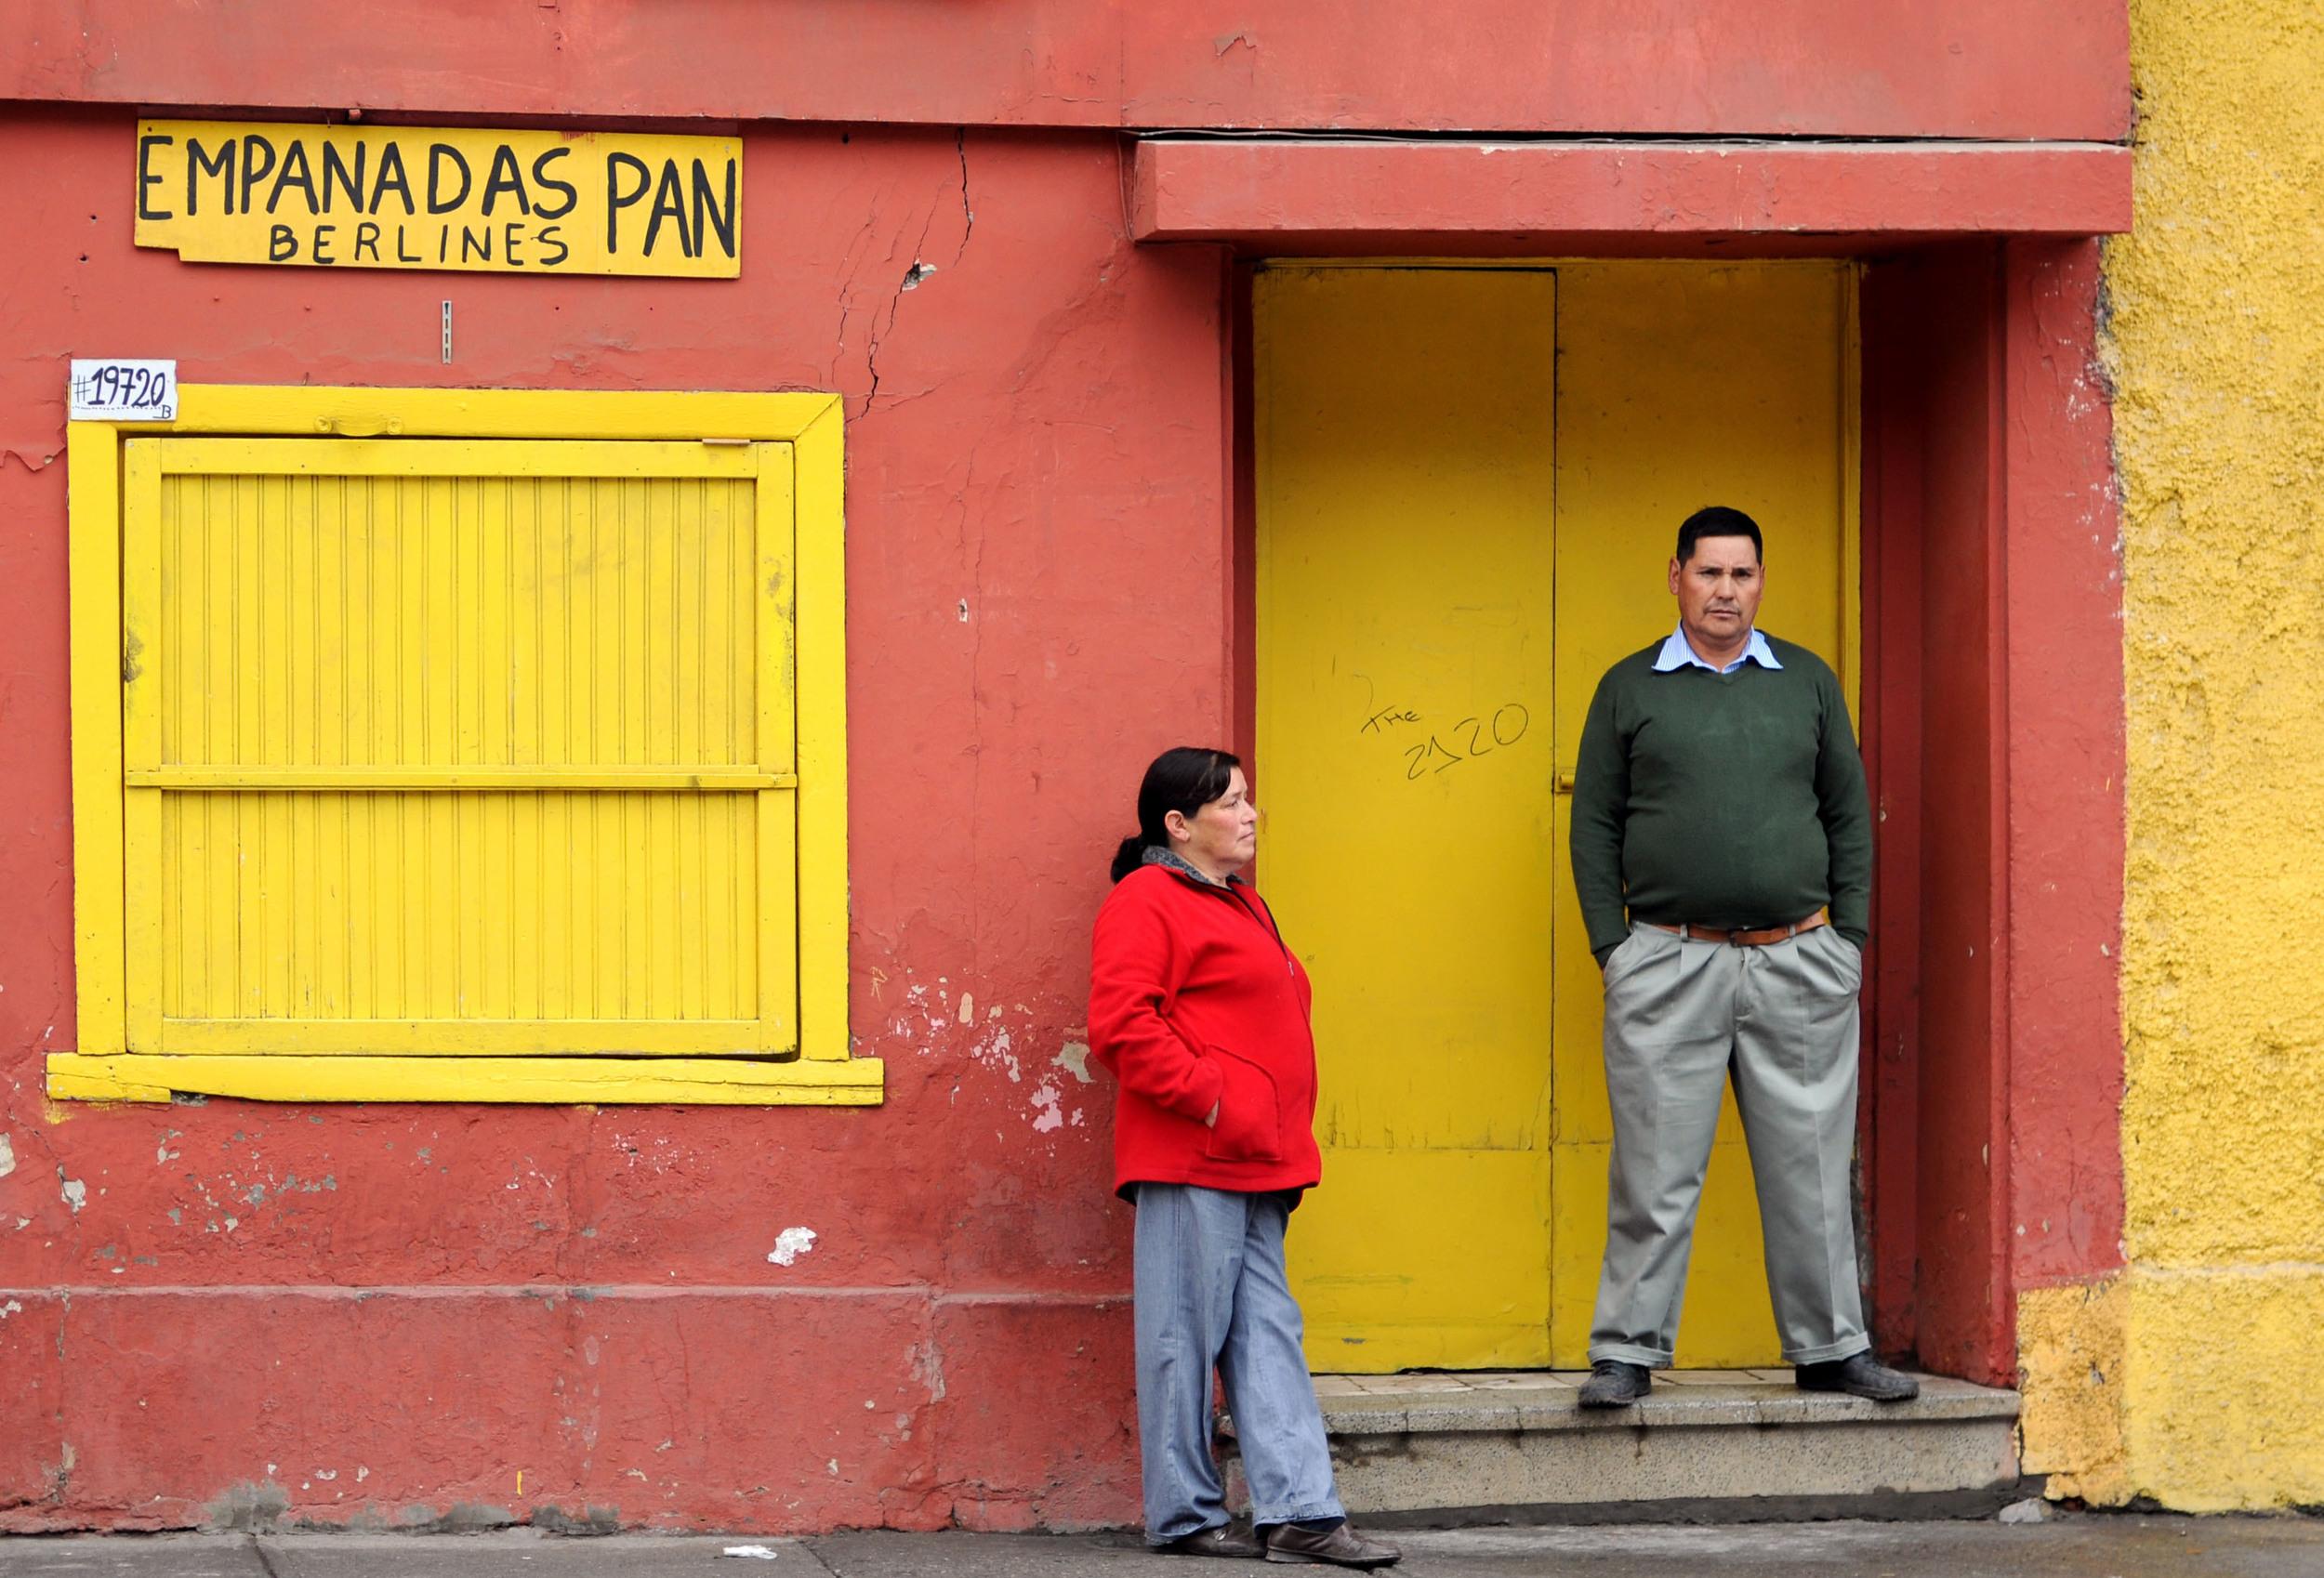 Outskirts of Santiago